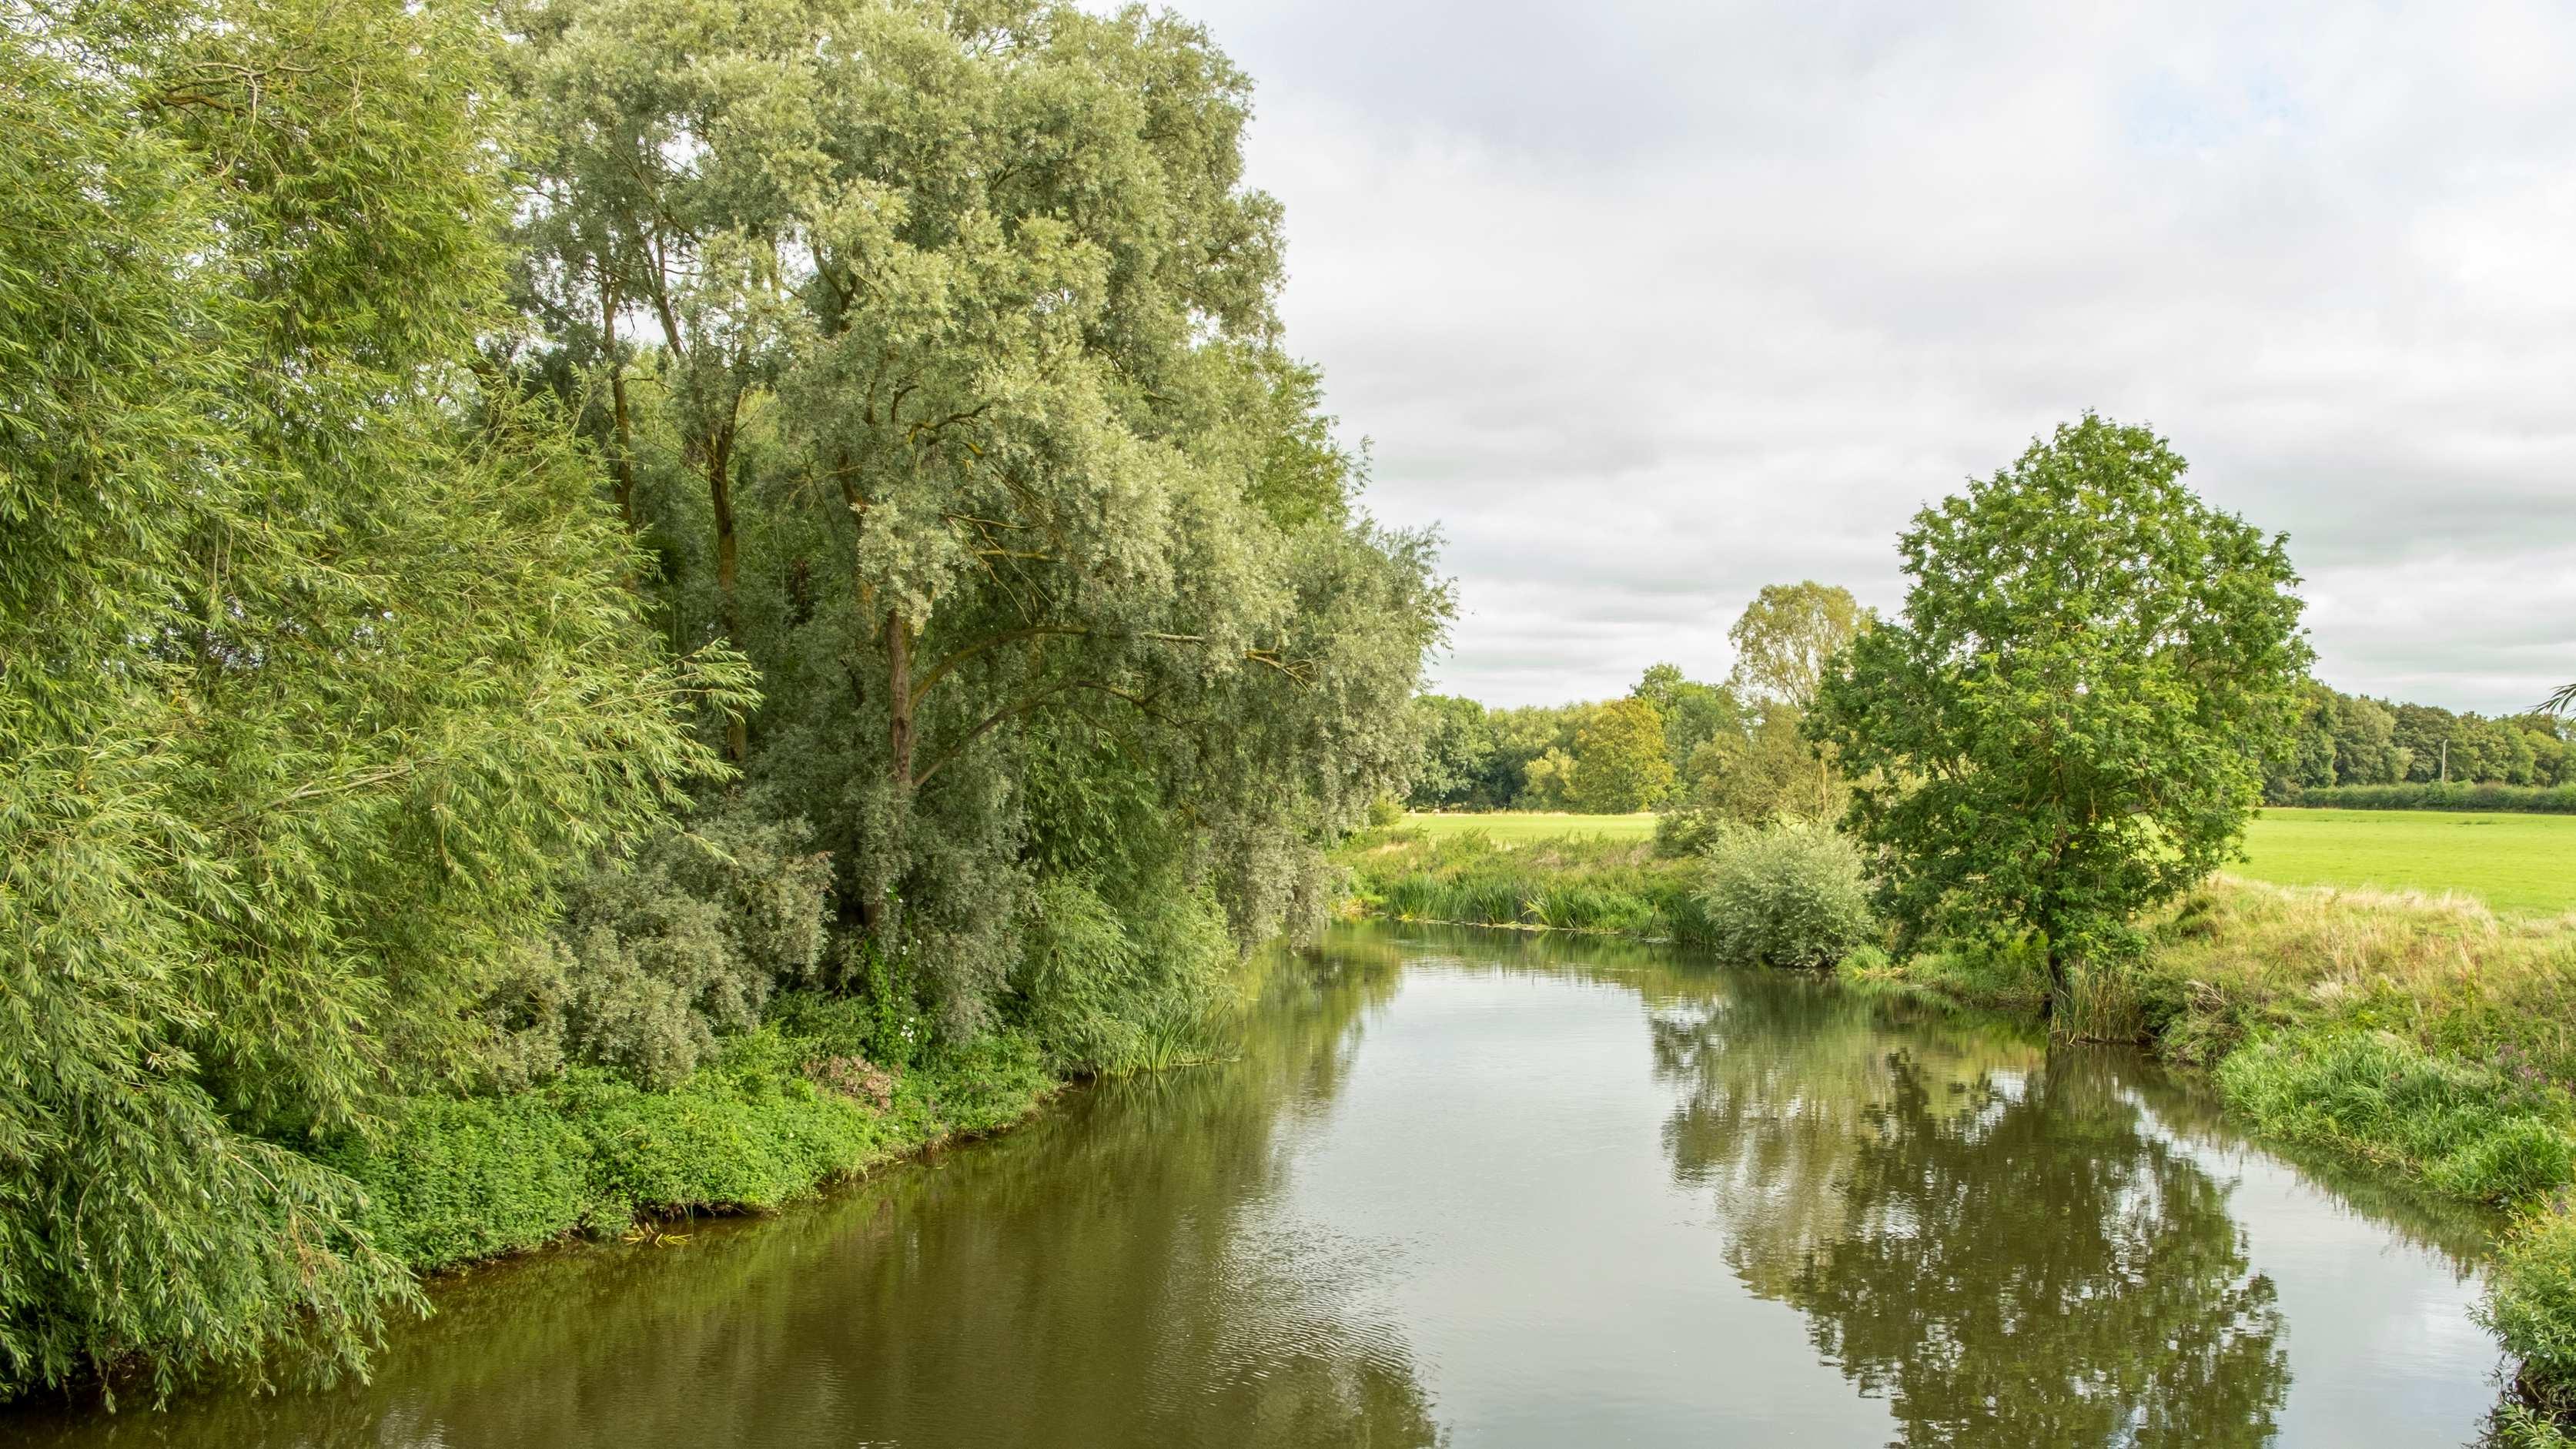 Norbury park